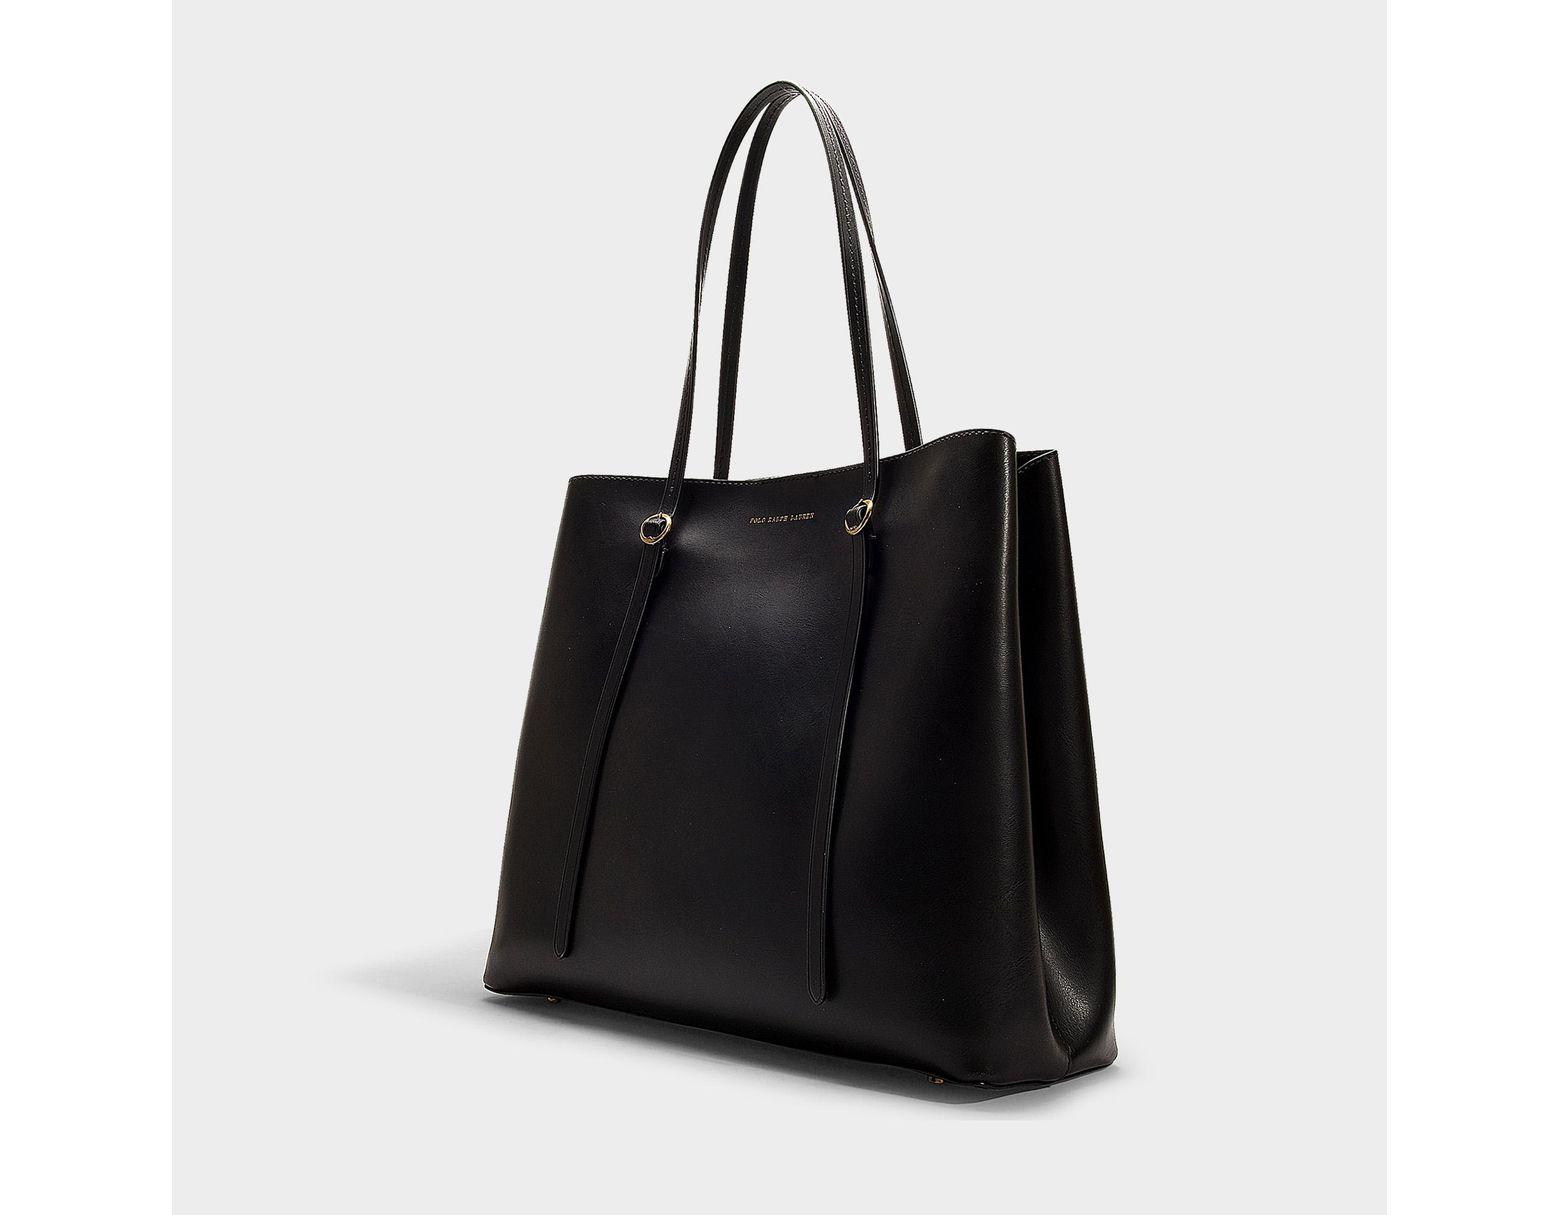 03b30512db Polo Ralph Lauren Big Lennox Tote Bag In Black Calfskin in Black - Save 73%  - Lyst